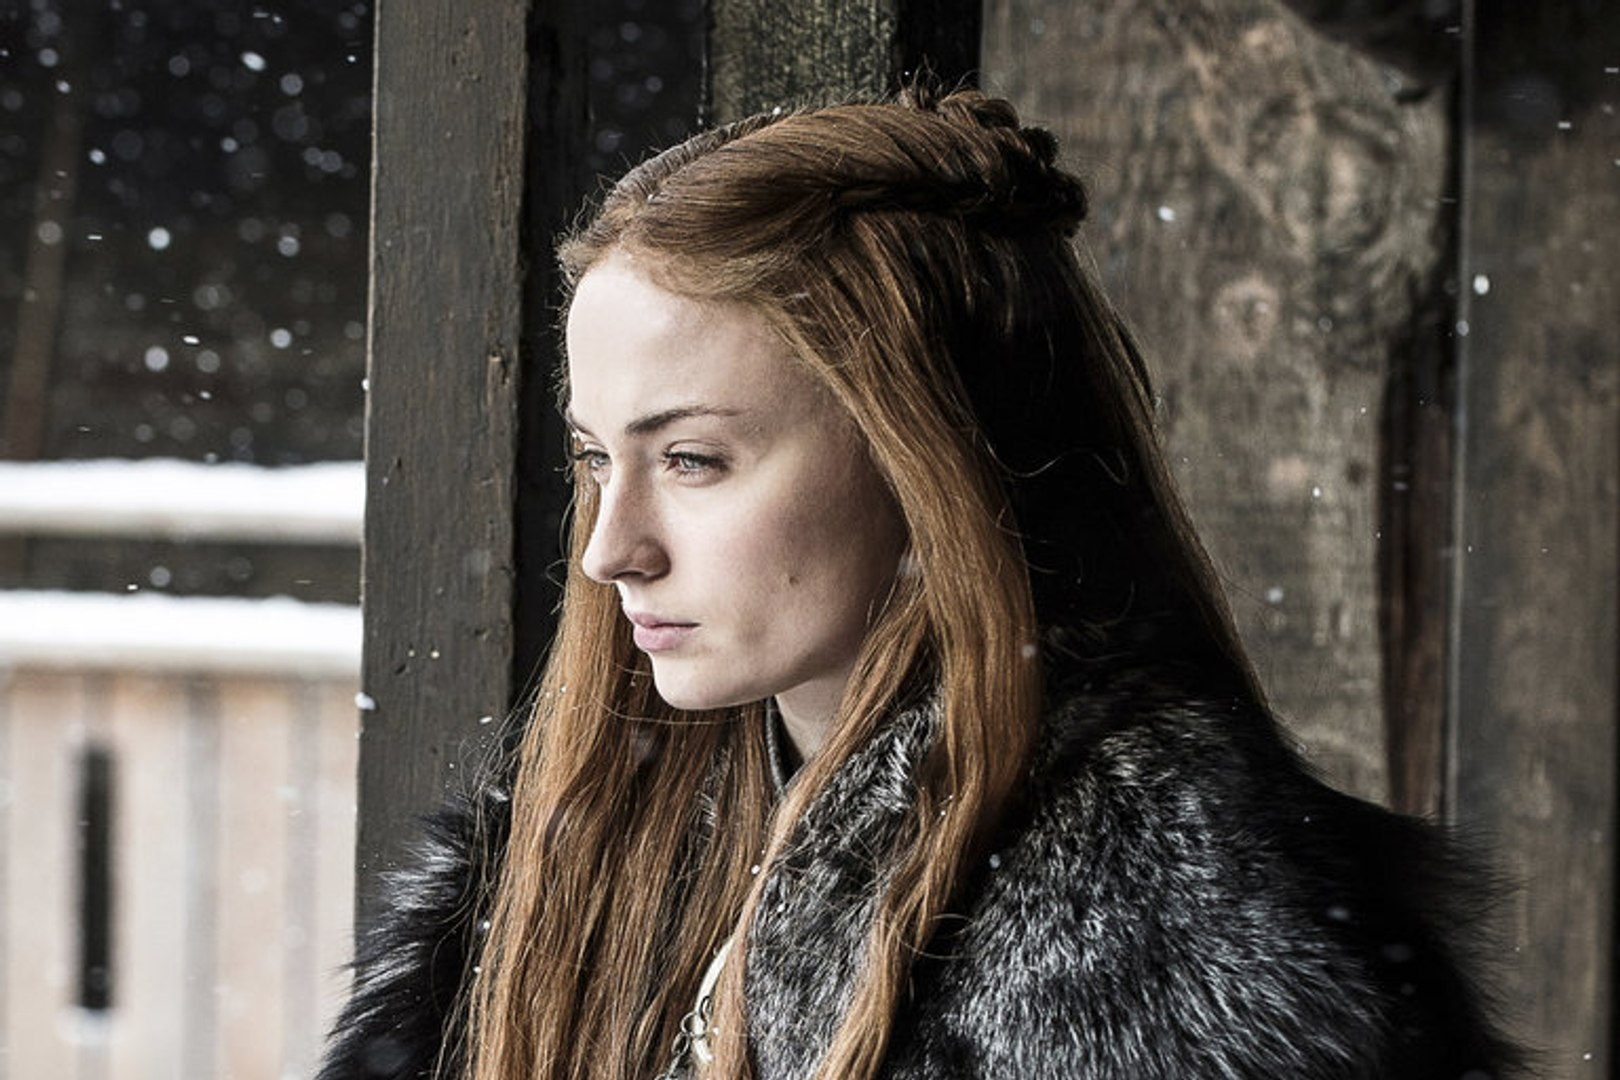 S7E7 Leaked: Game of Thrones Season 7 Episode 7   GOT 7x07 Leaked Scenes